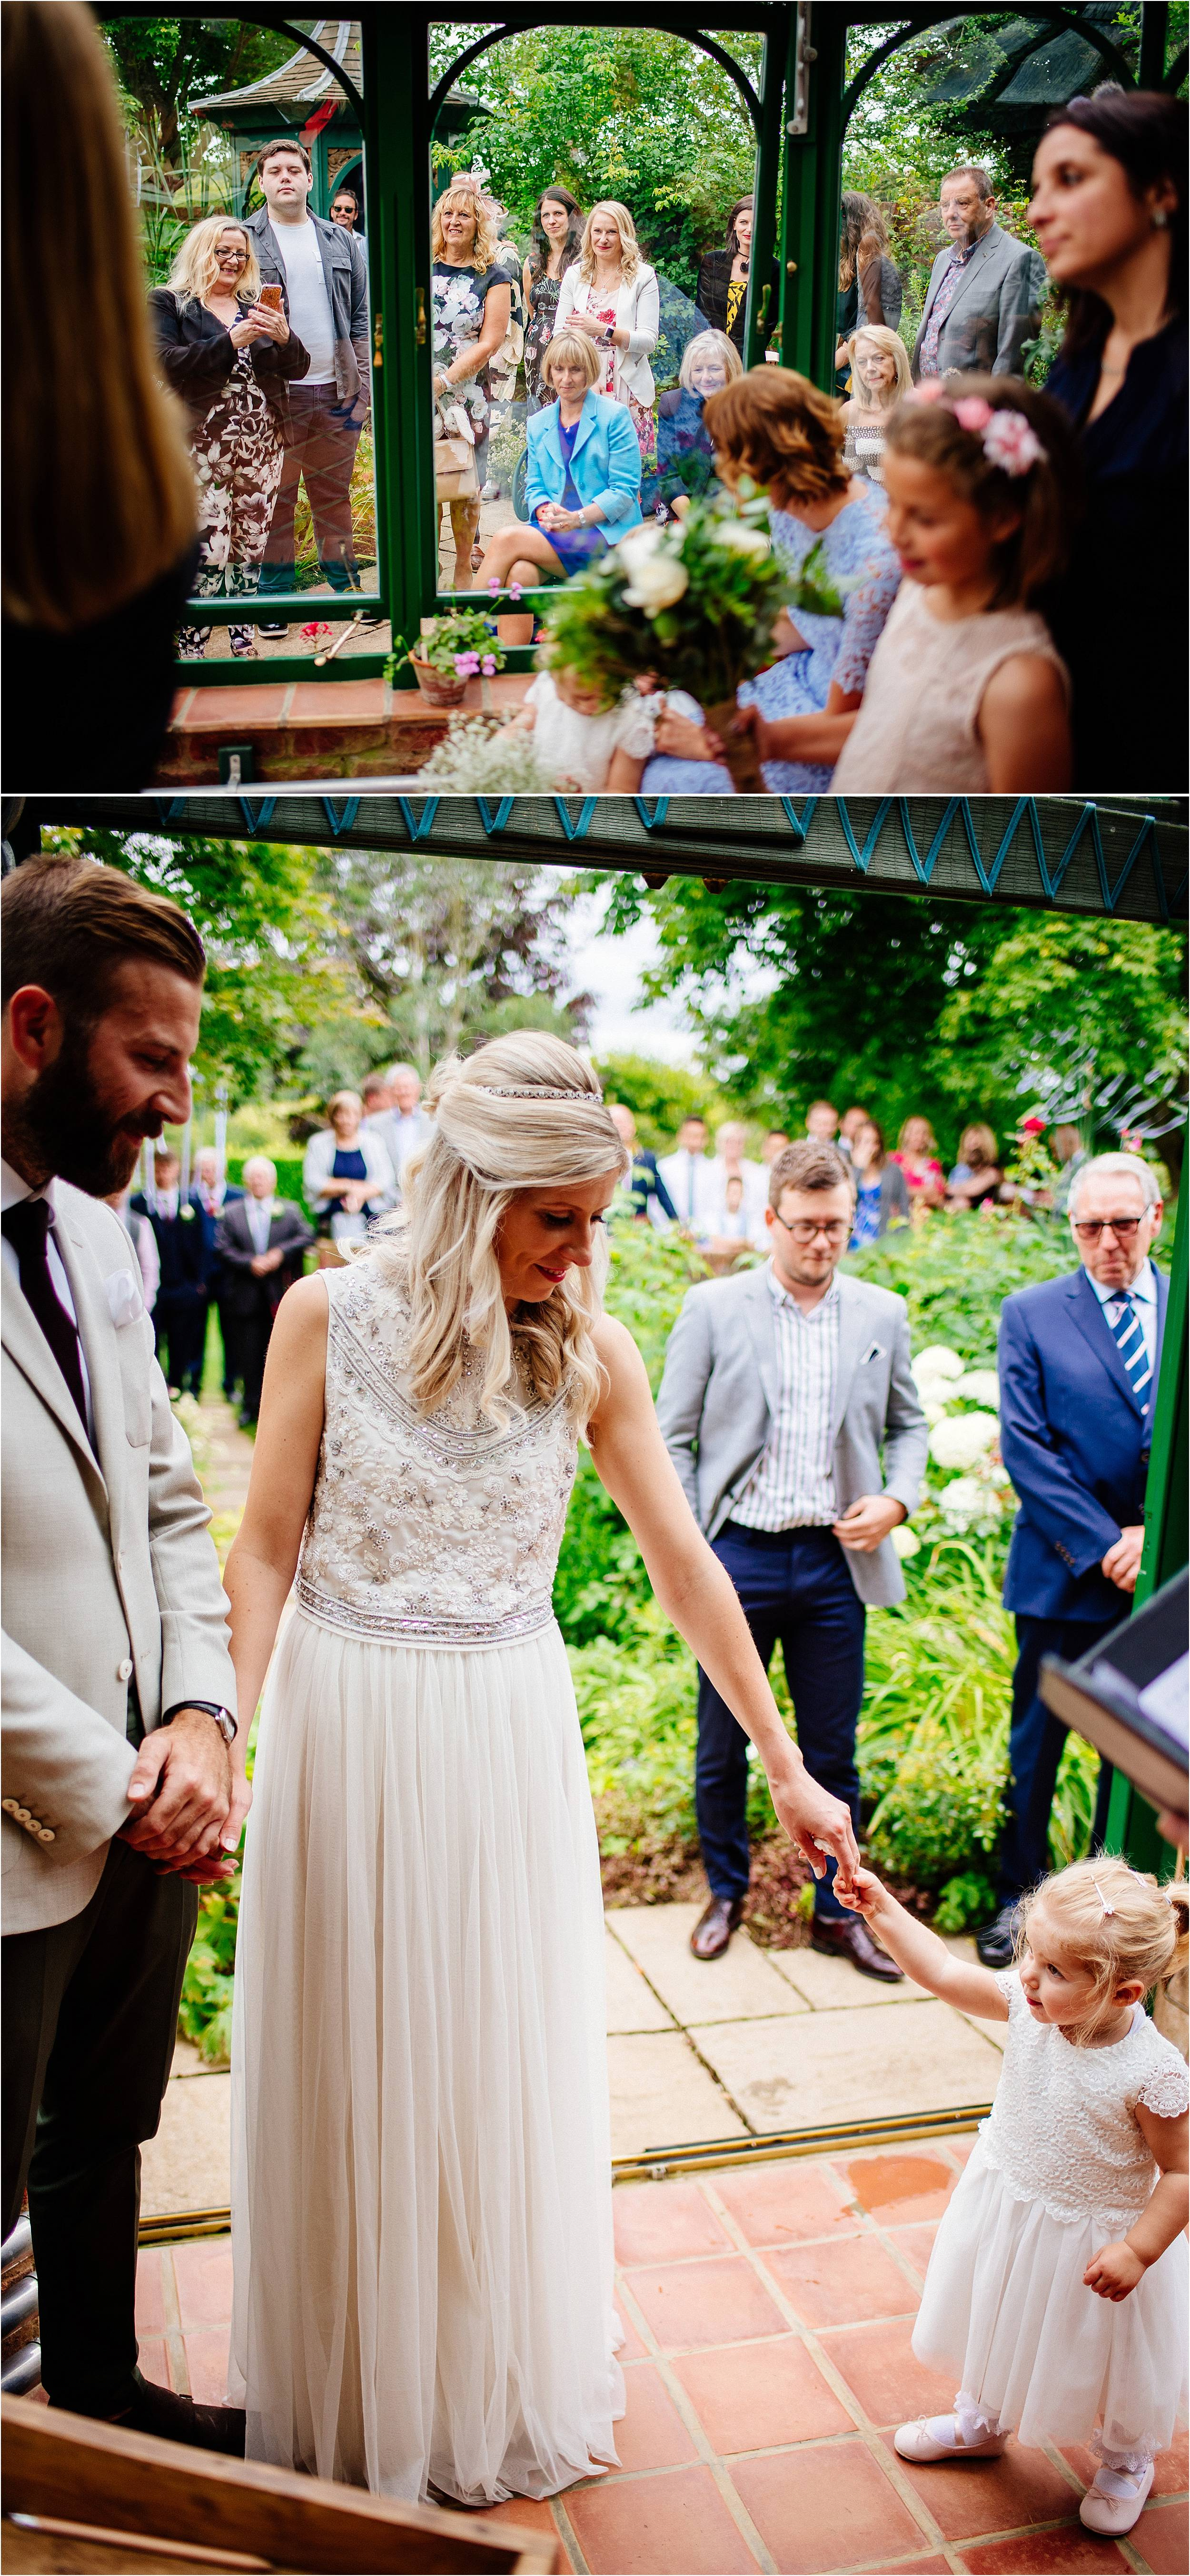 Barnsdale Gardens Wedding Photographer_0026.jpg